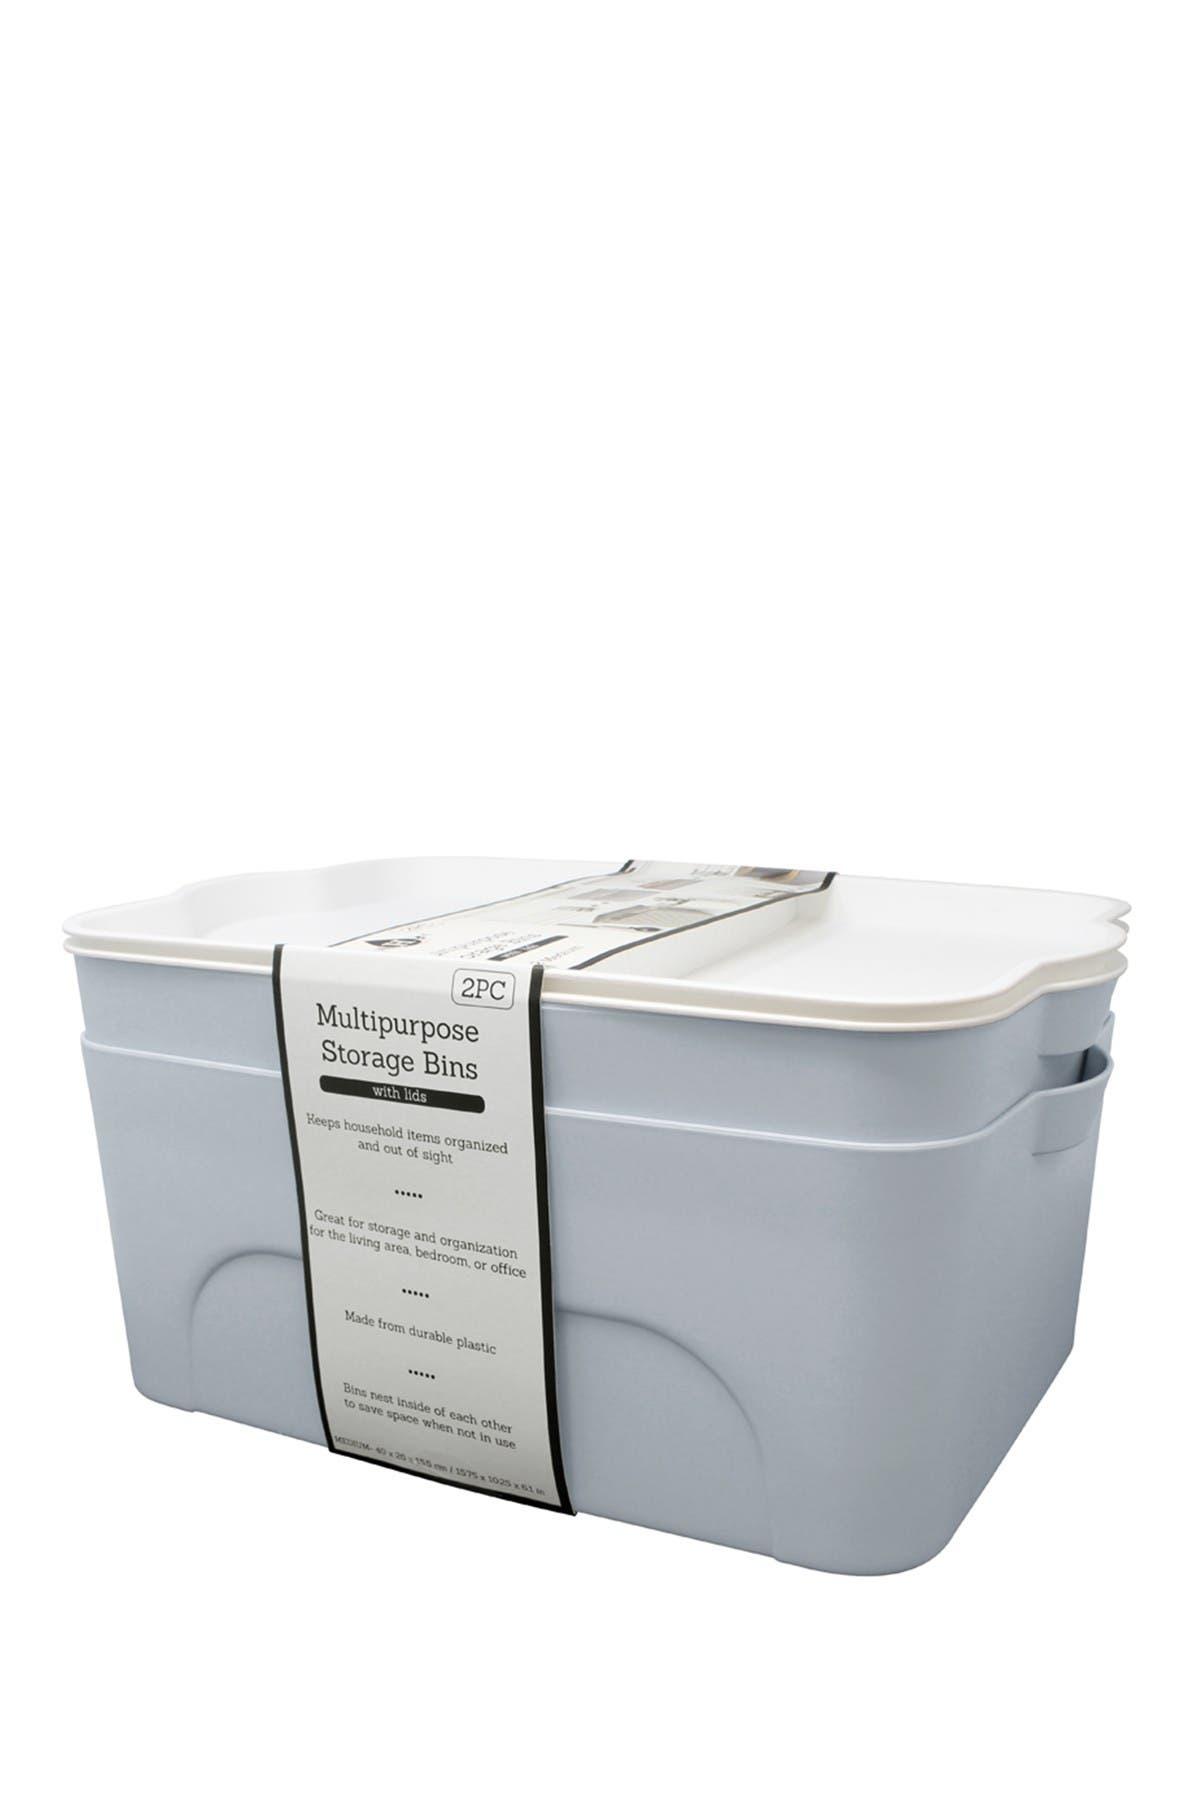 Image of Gourmet Home Heritage Dusty Blue Medium Multipurpose Storage Bins - Set of 2